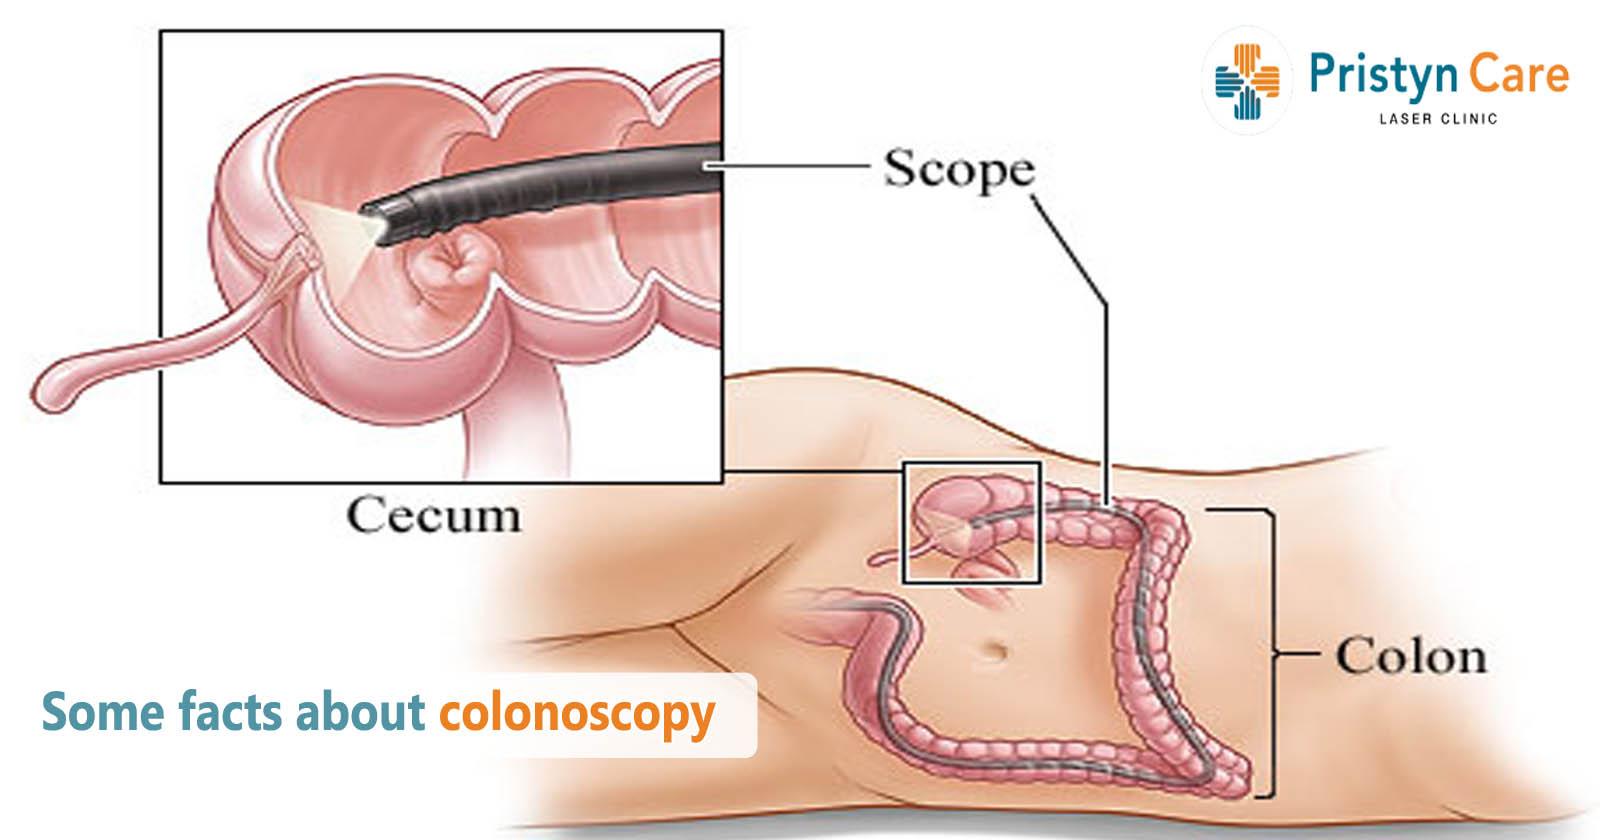 facts-about-colonoscopy